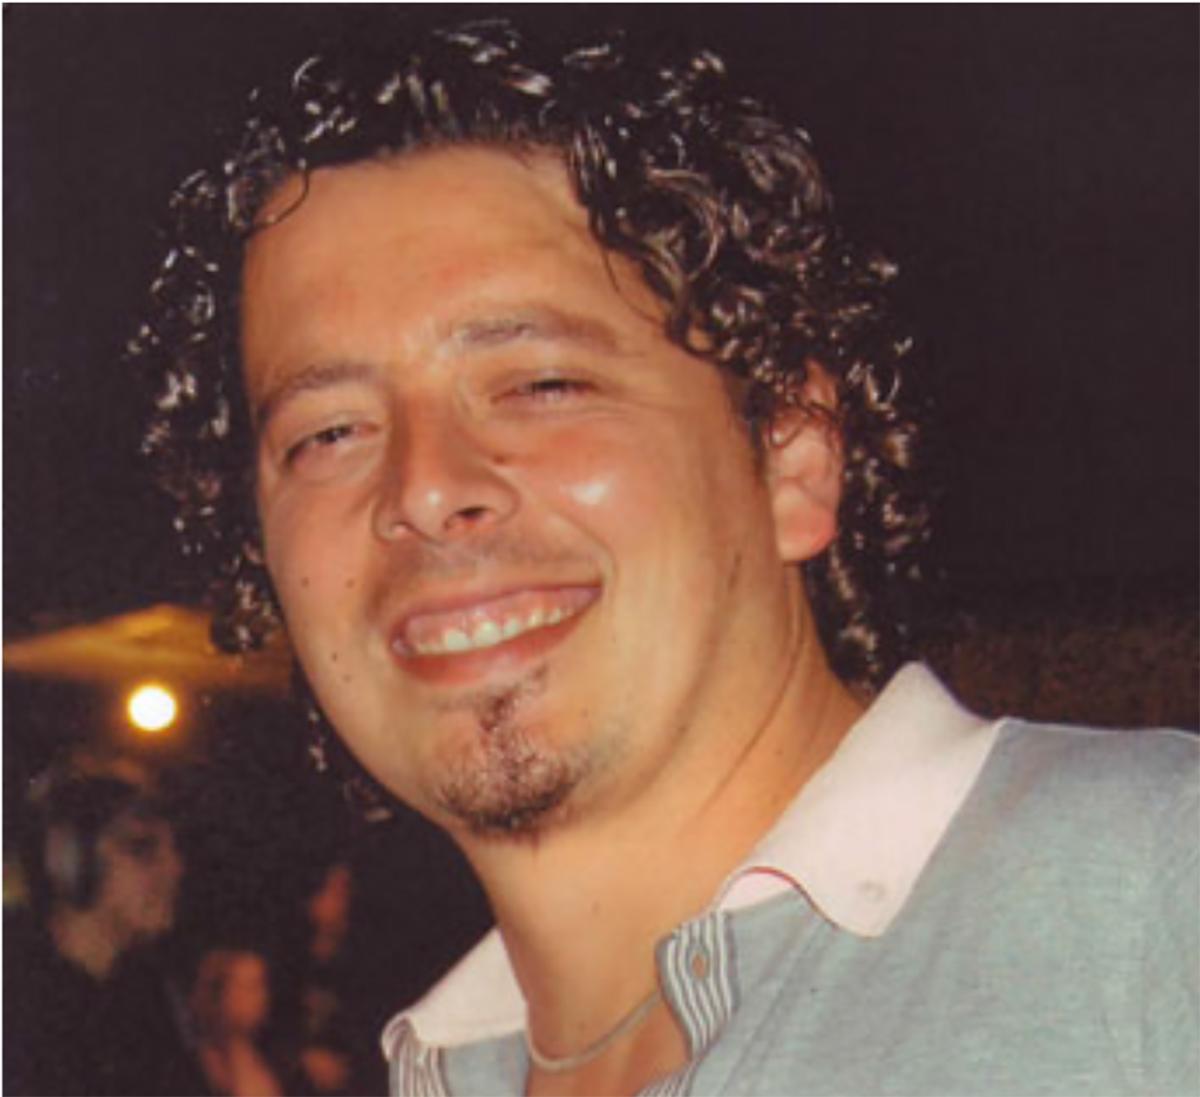 Luca Gambicorti